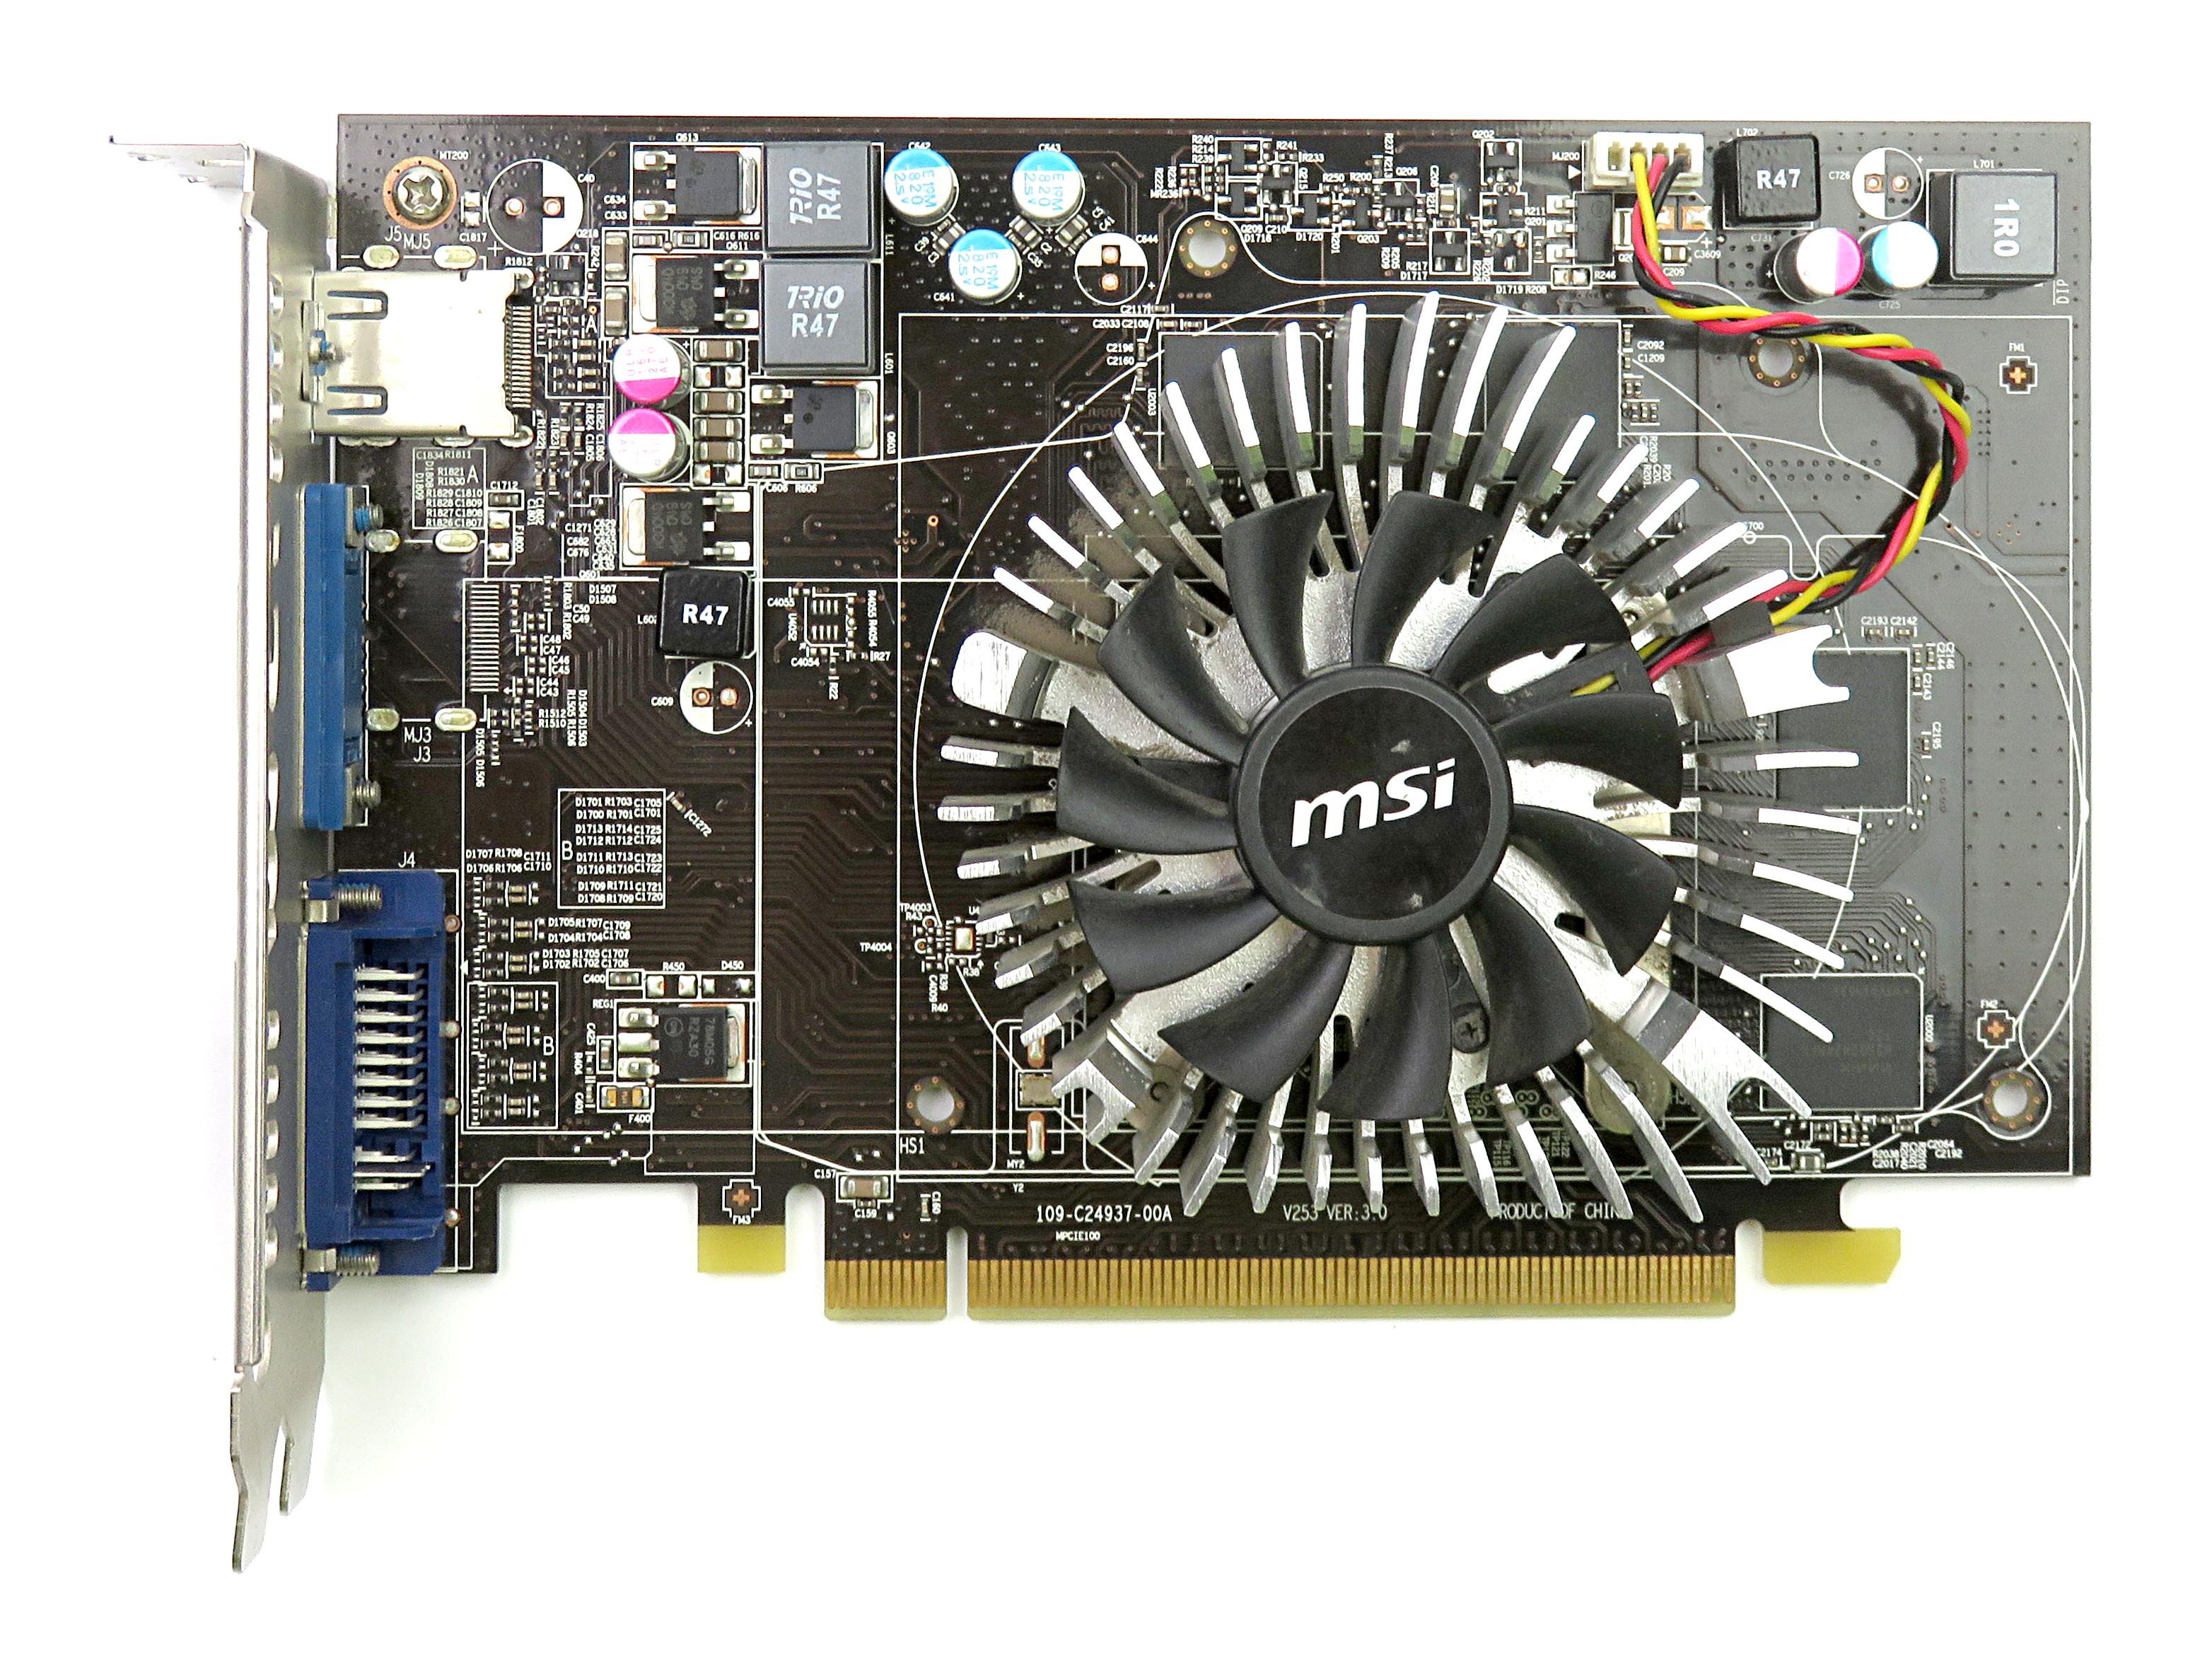 MSI AMD Radeon HD 6670 1GB GDDR5 PCIe Graphics Card R6670-MD1GD5 HDMI/DVI-I/VGA